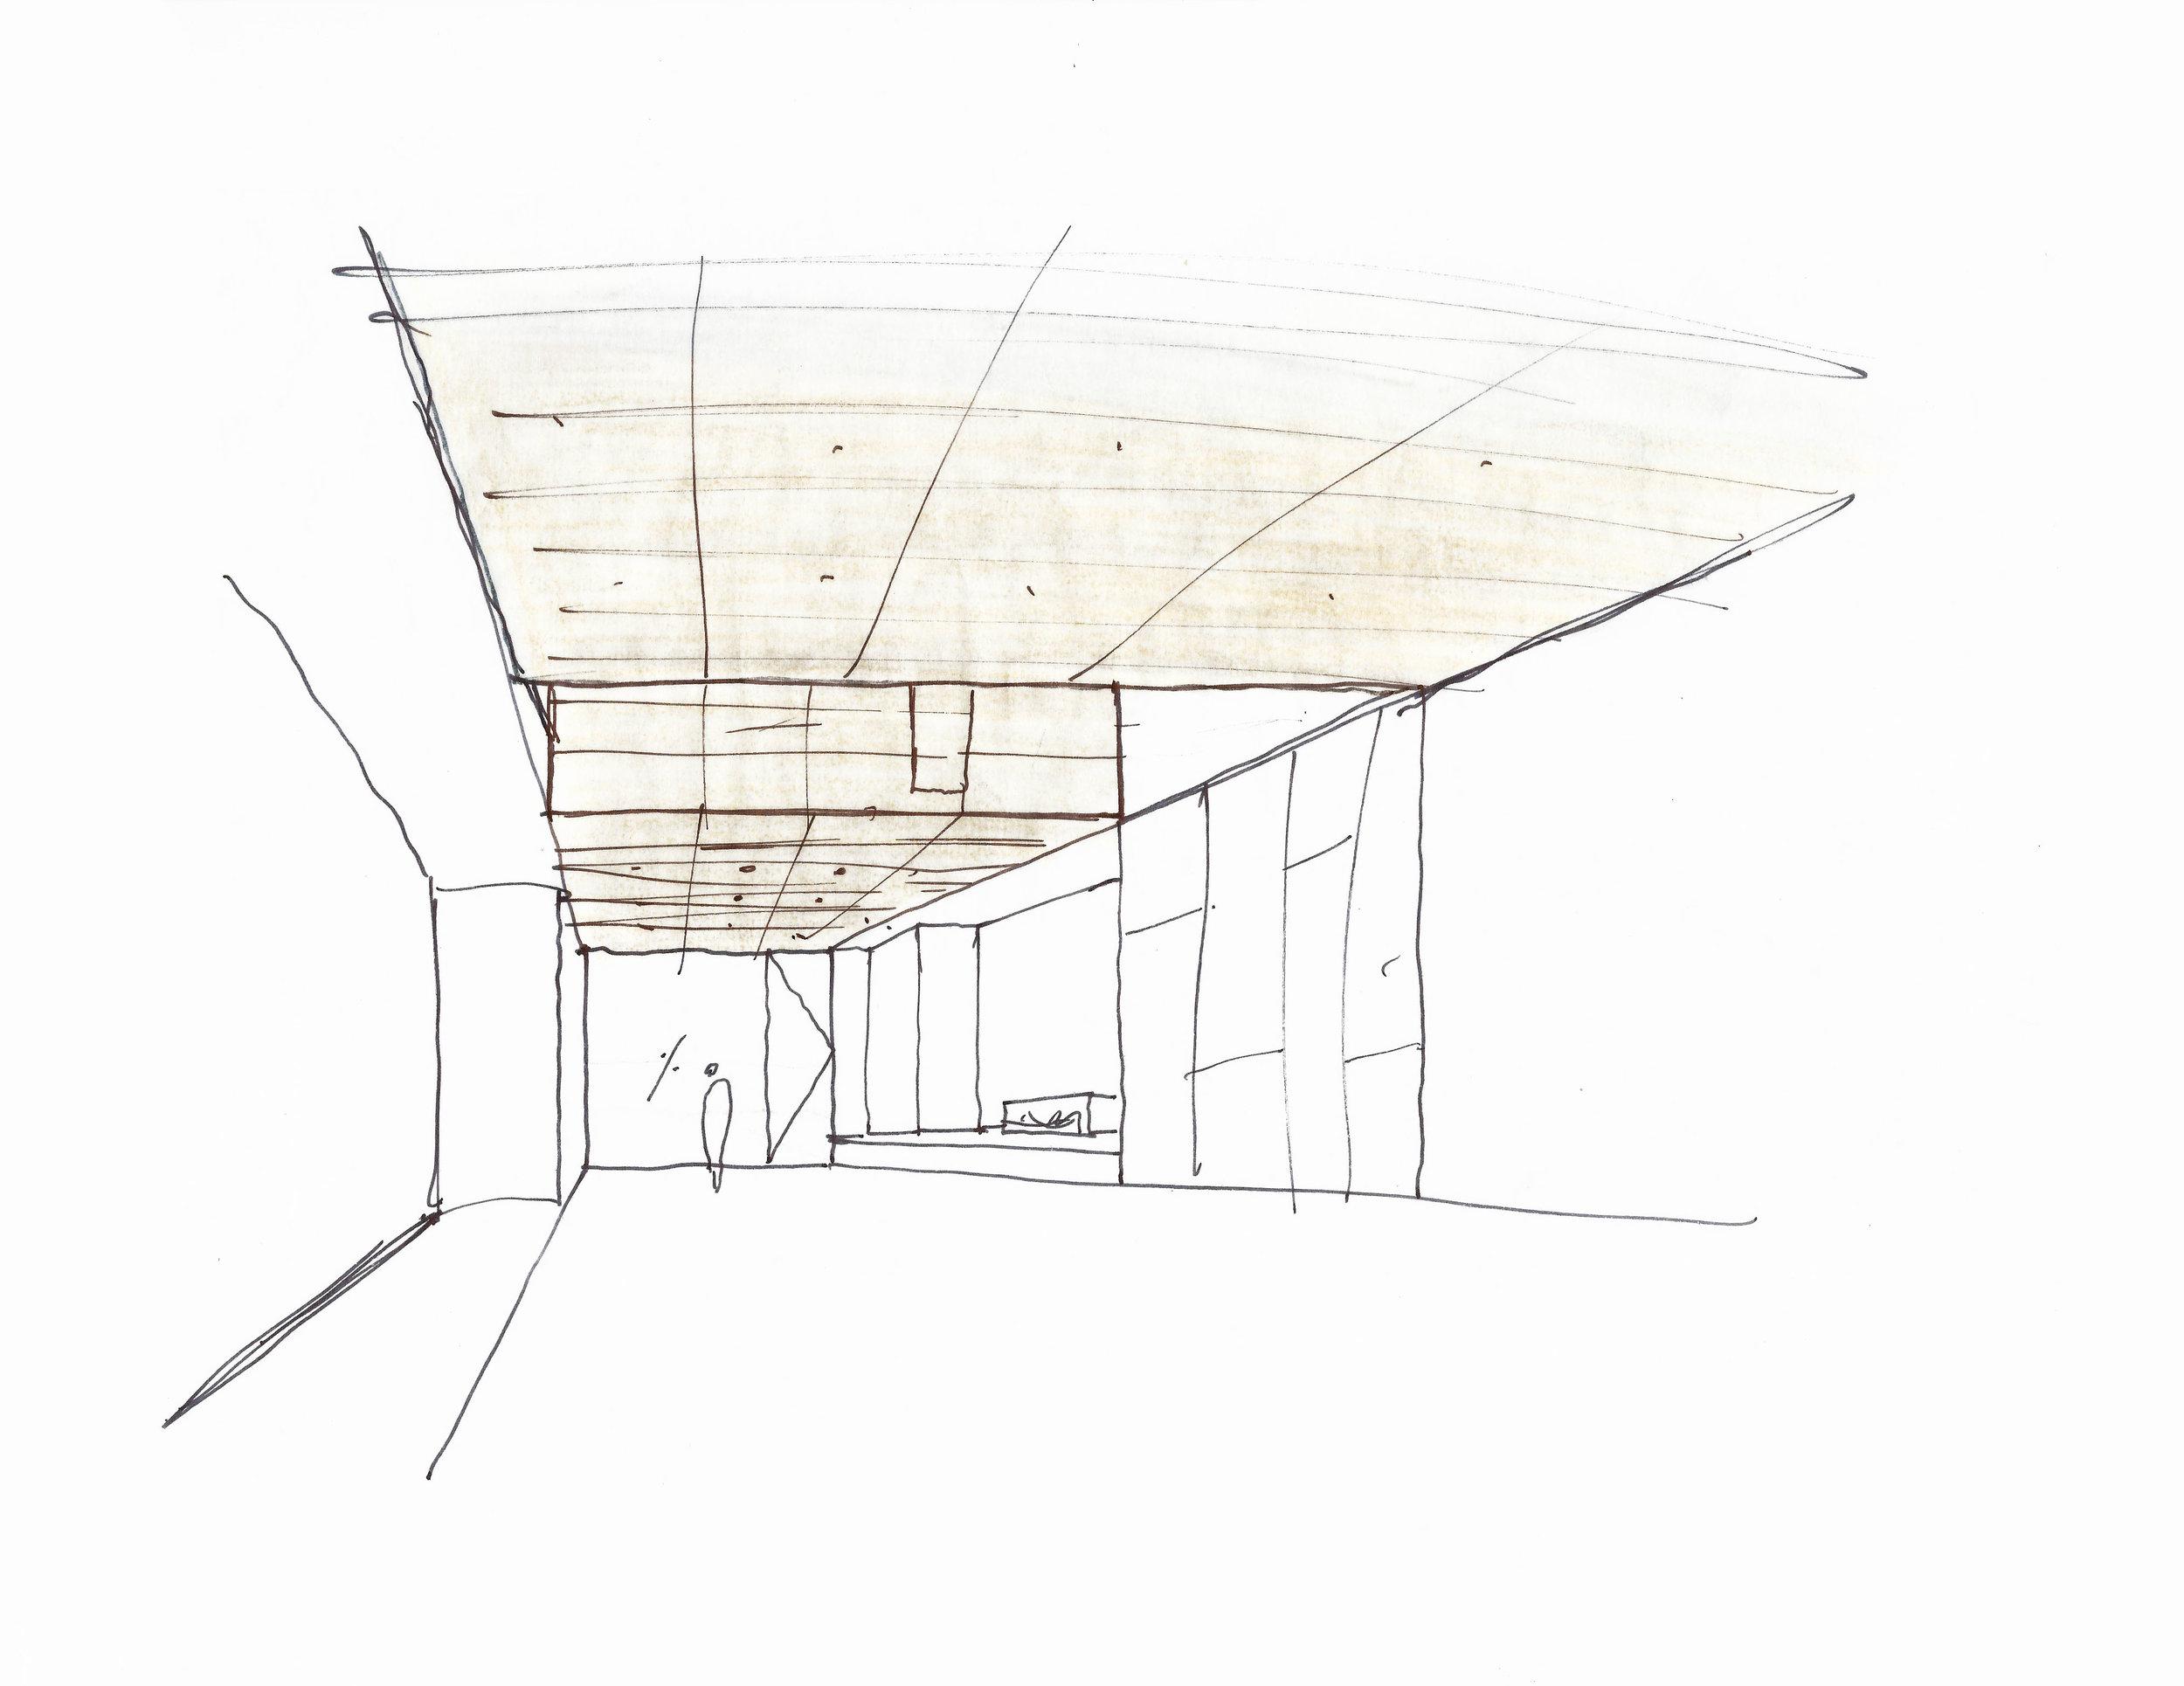 40 Beaconsfield Sketch_03.jpg